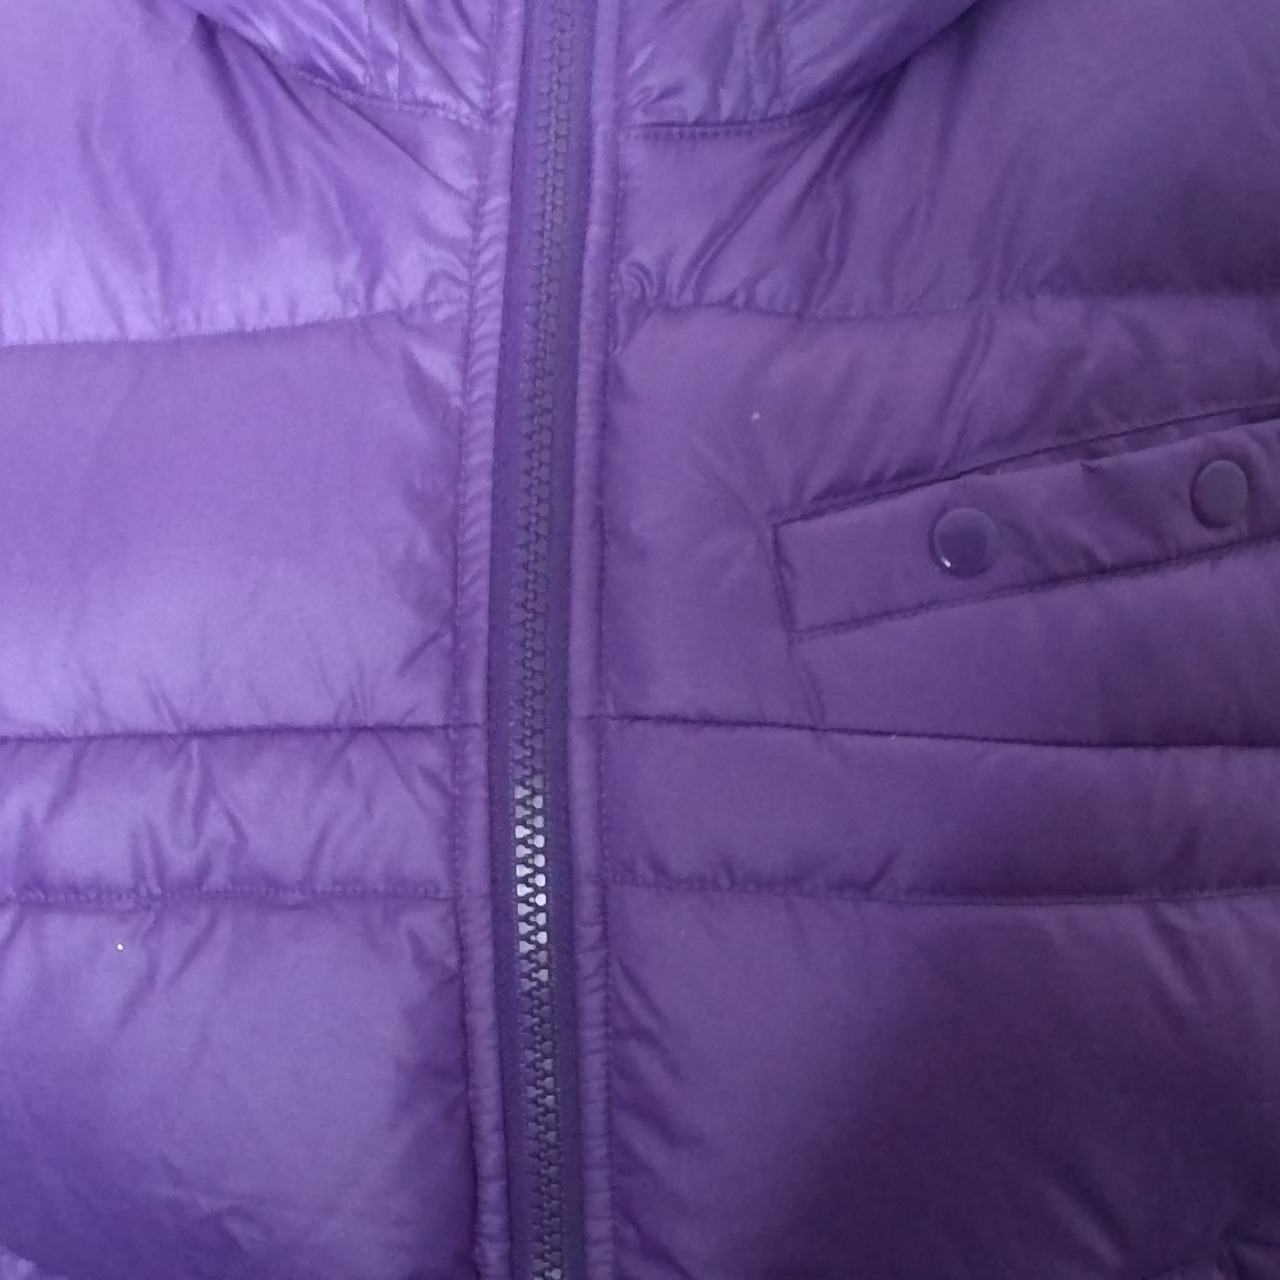 BNWT NIKE Womens  Hooded Puffer Jacket Purple Size Small Duck Down Fill